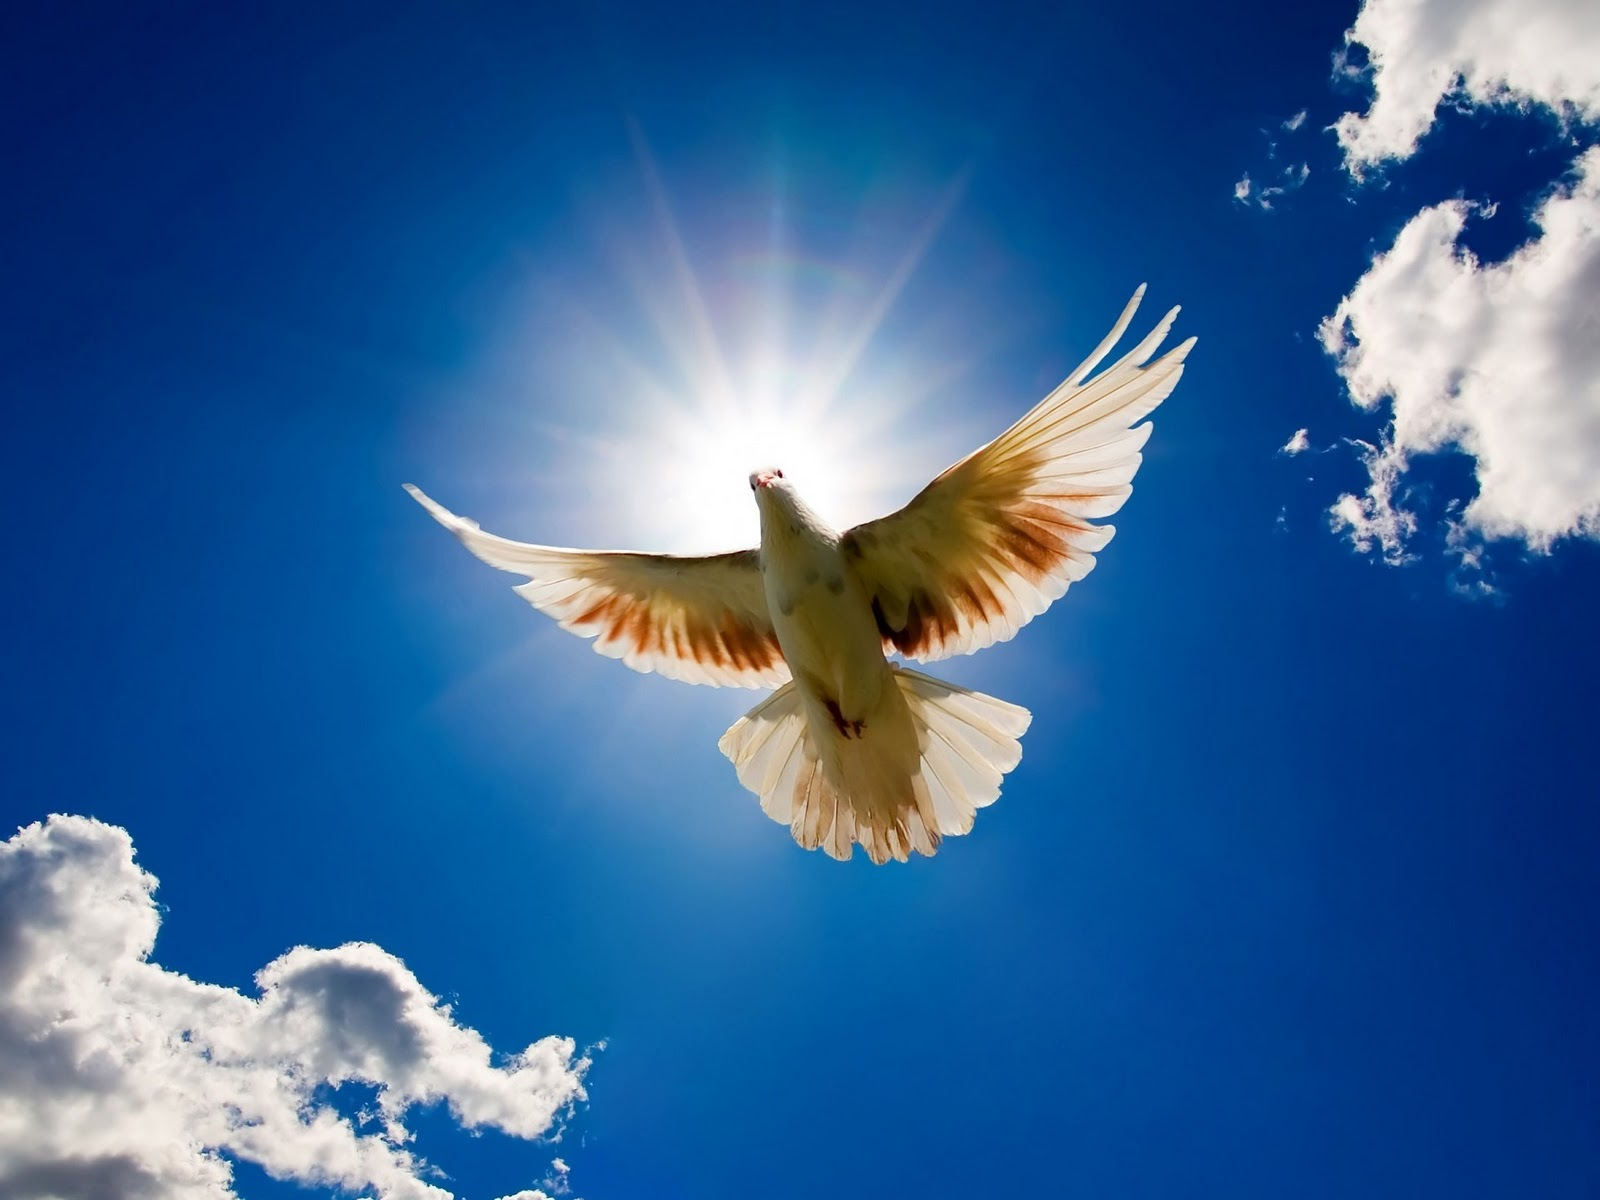 Freedom Birds Flying Hd Wallpaper Bird: Best Desktop HD Wallpapers: Bird Desktop